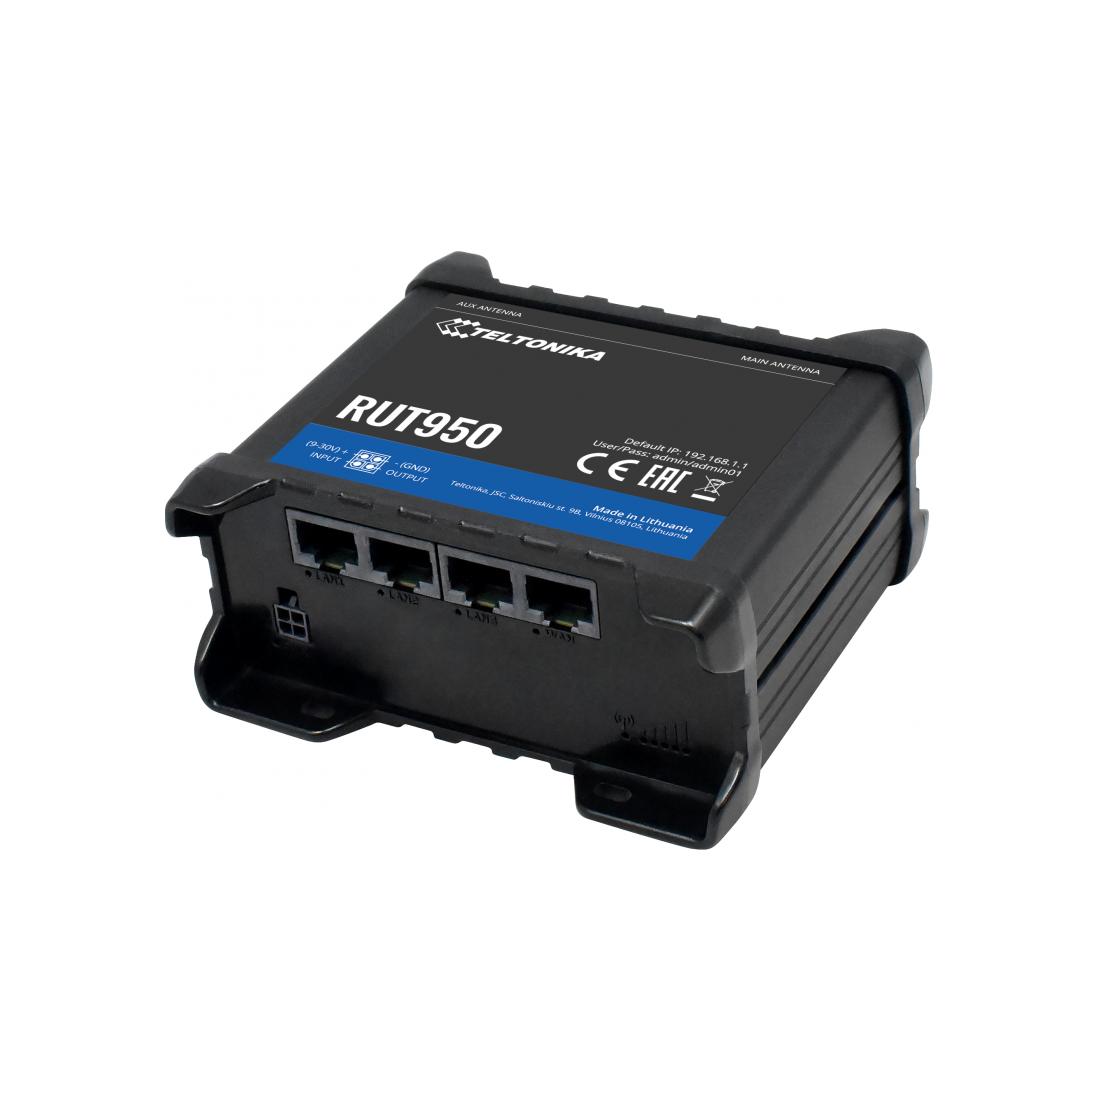 Teltonika Router 4G RUT 955 con seriale,IO,GPS